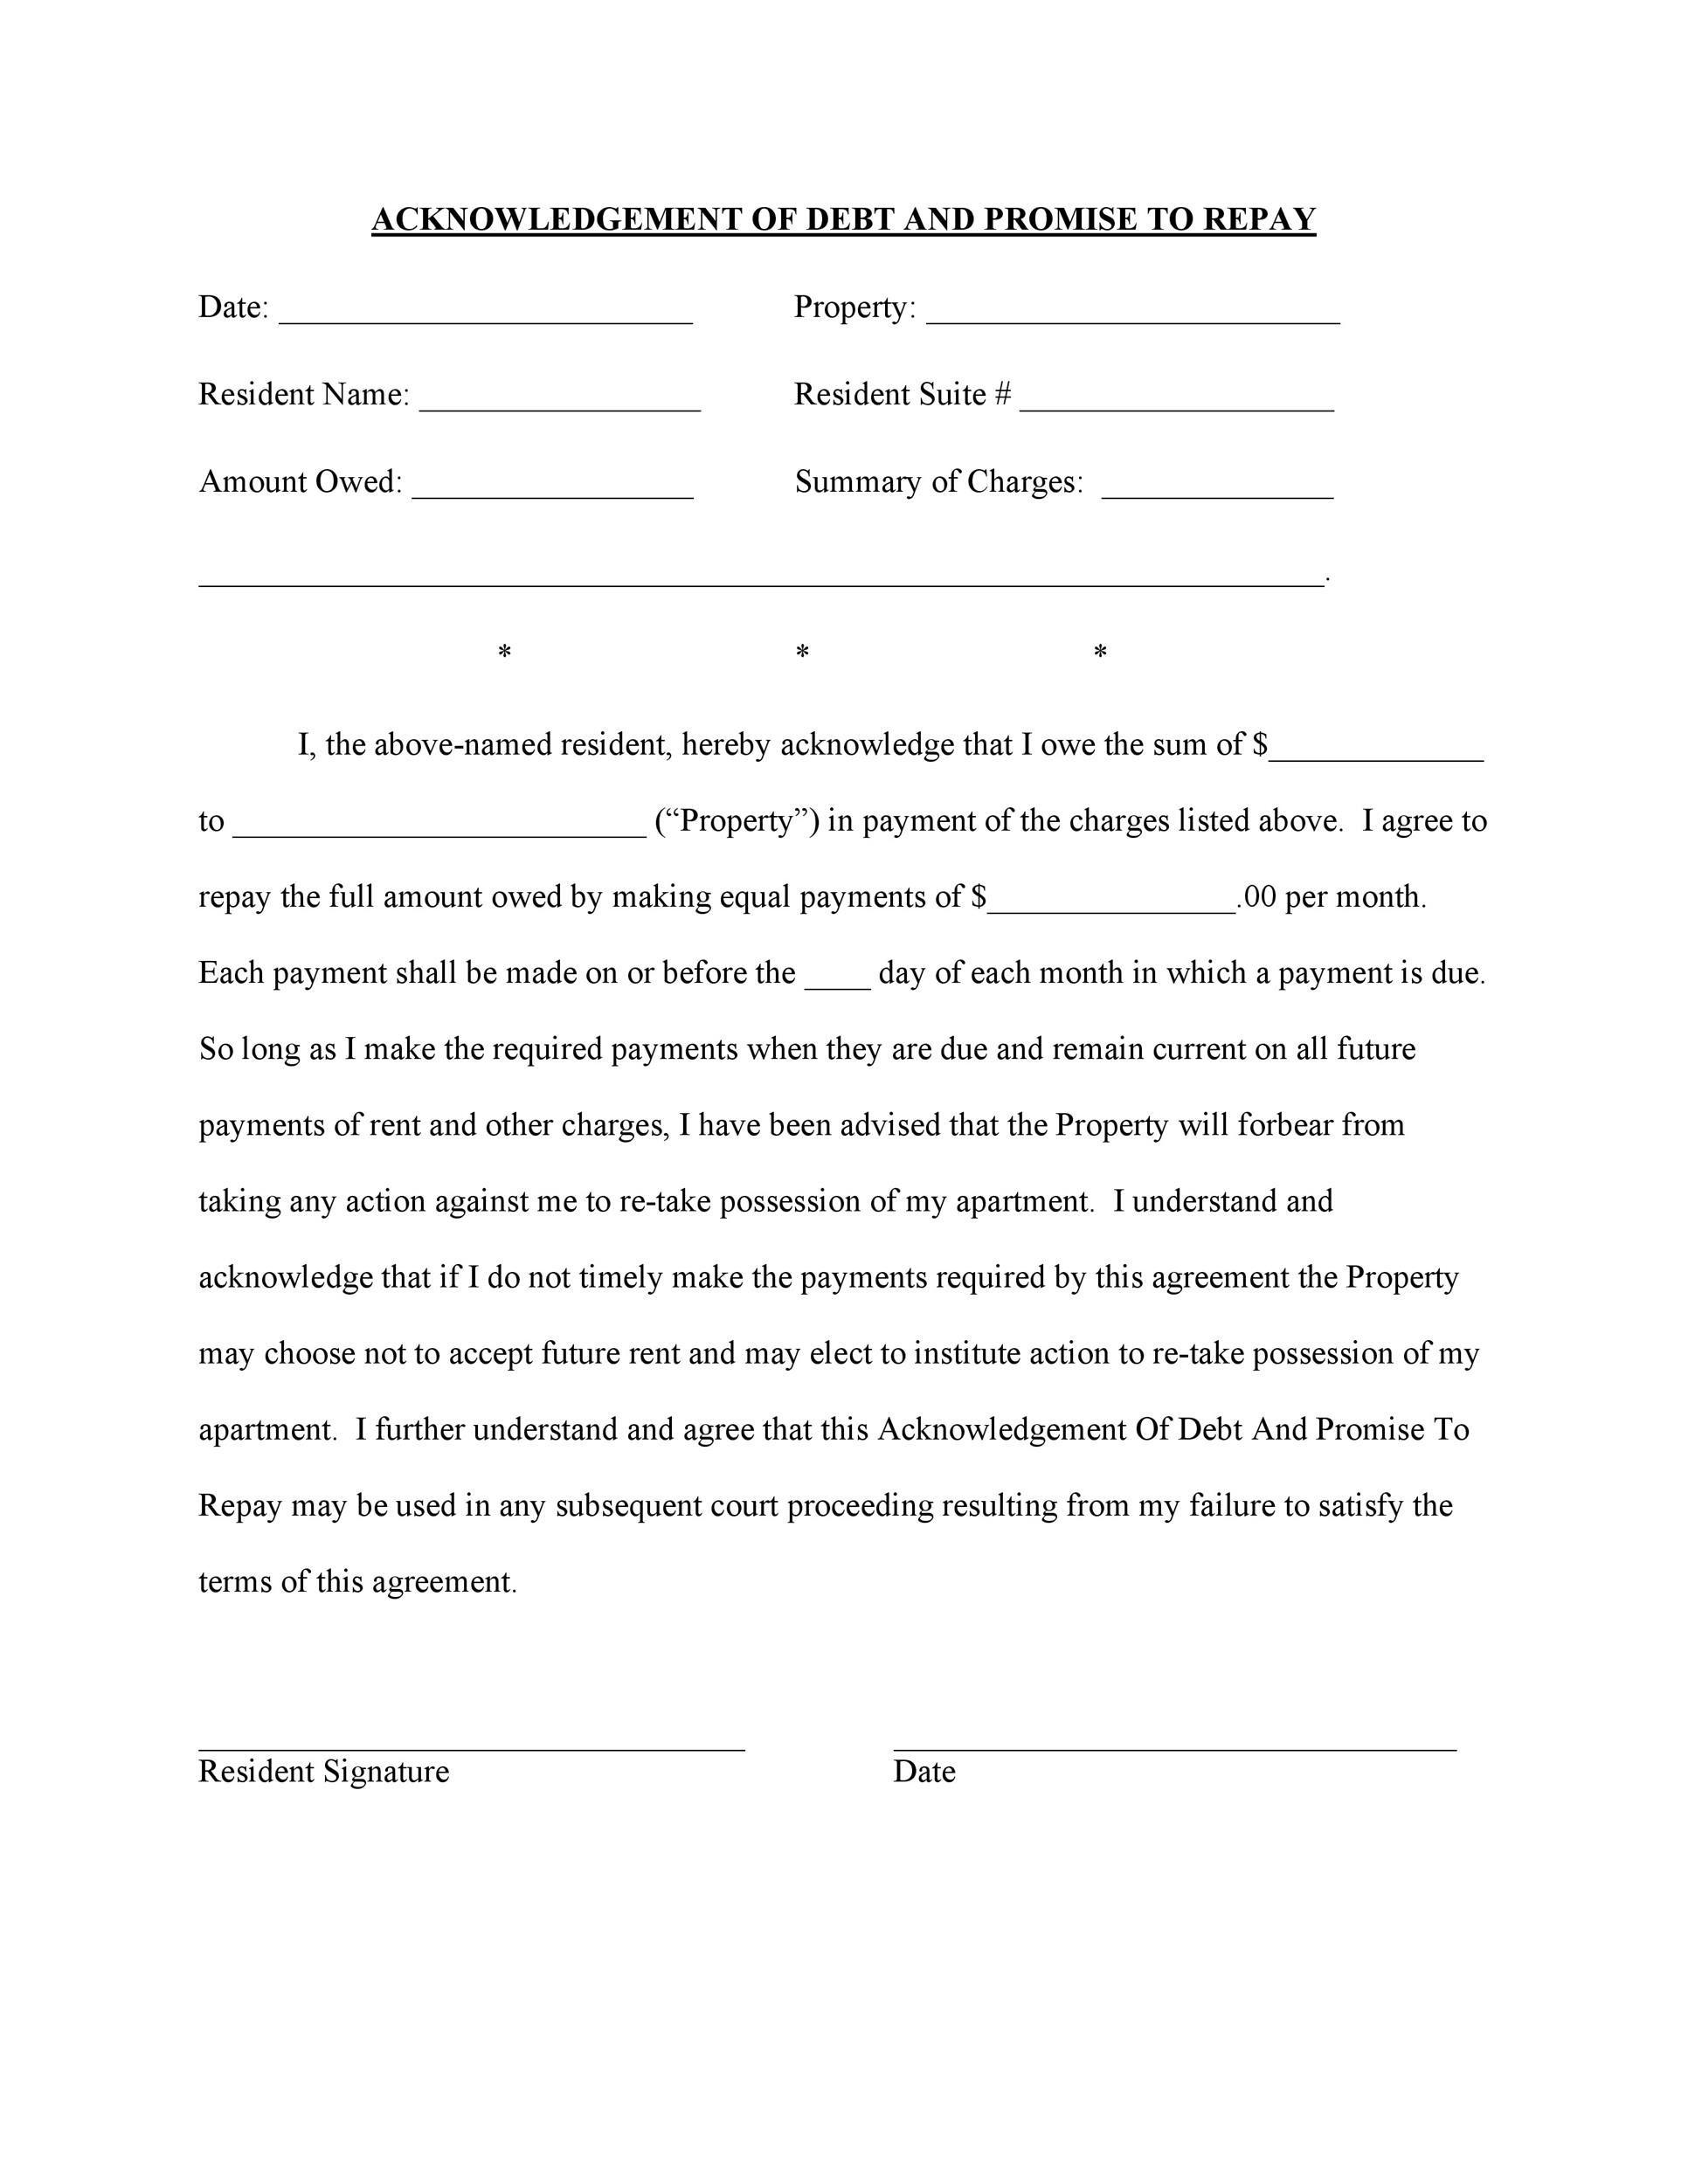 008 Unforgettable Free Family Loan Agreement Template Nz Idea Full